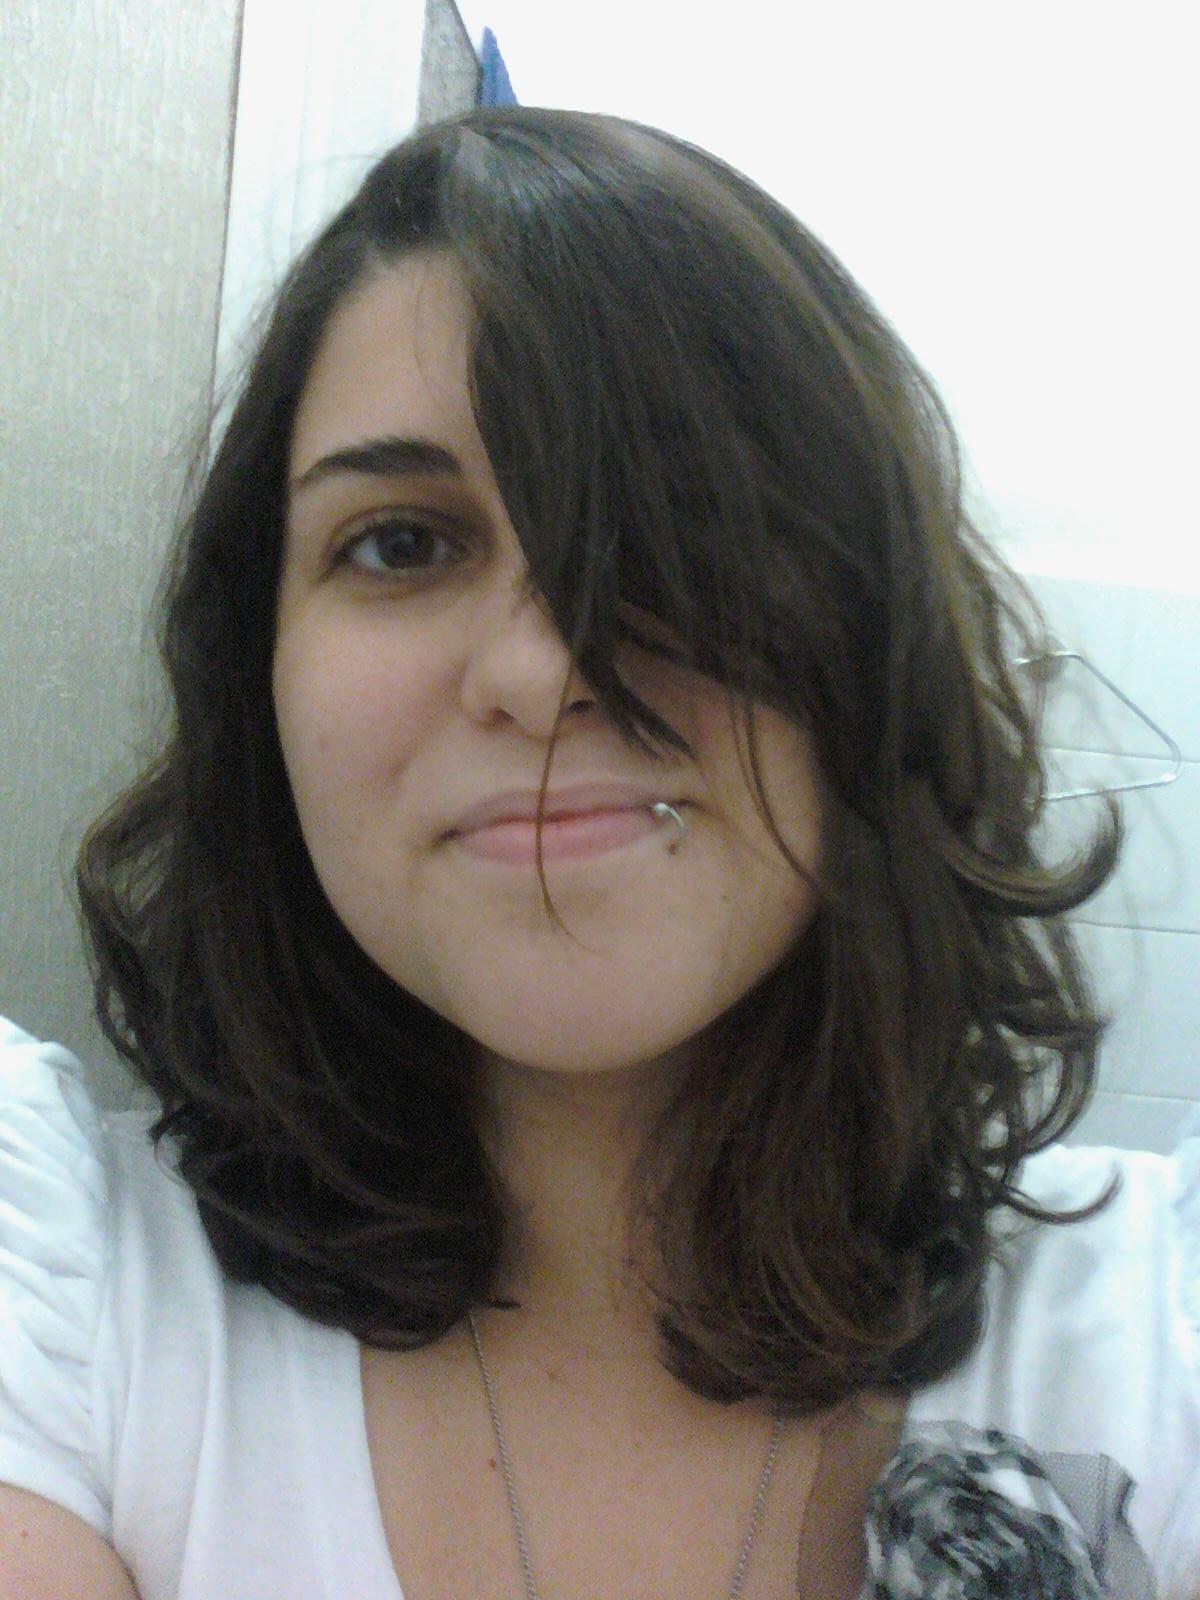 nicolle  traducteur professionnel de  espagnol latino